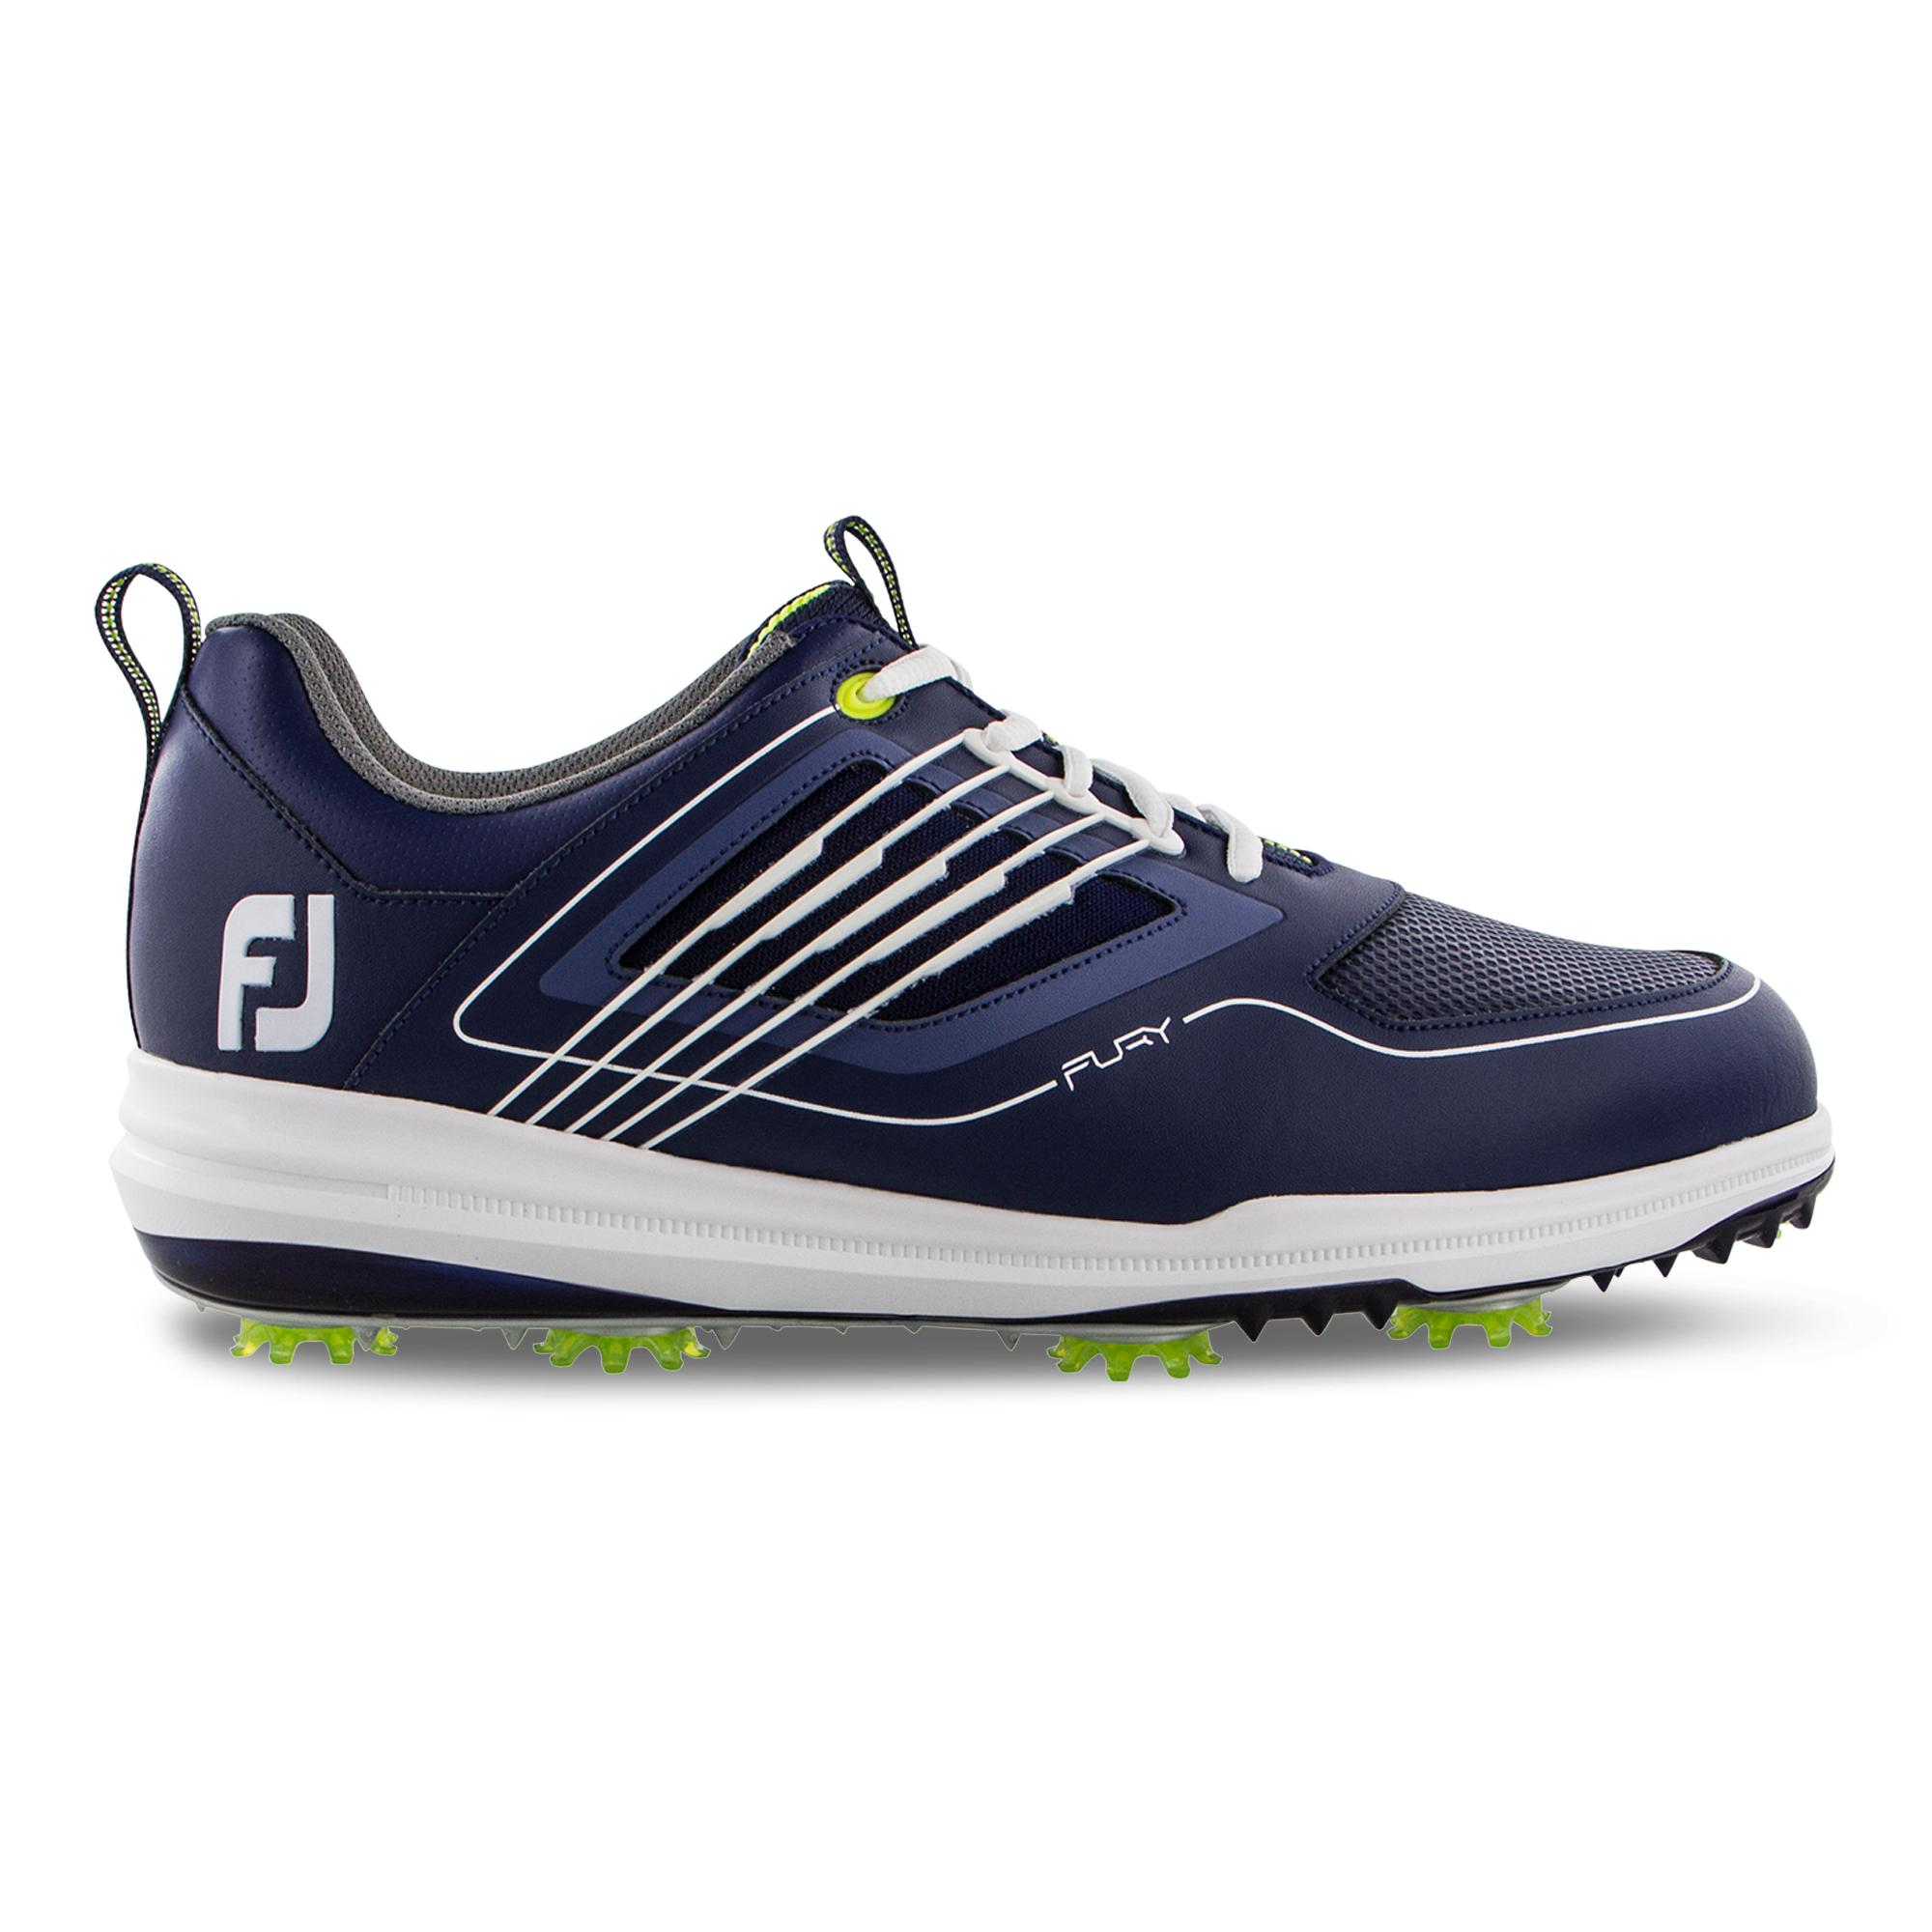 Men's Fury Spiked Golf Shoe - NAVY/WHITE/GREEN